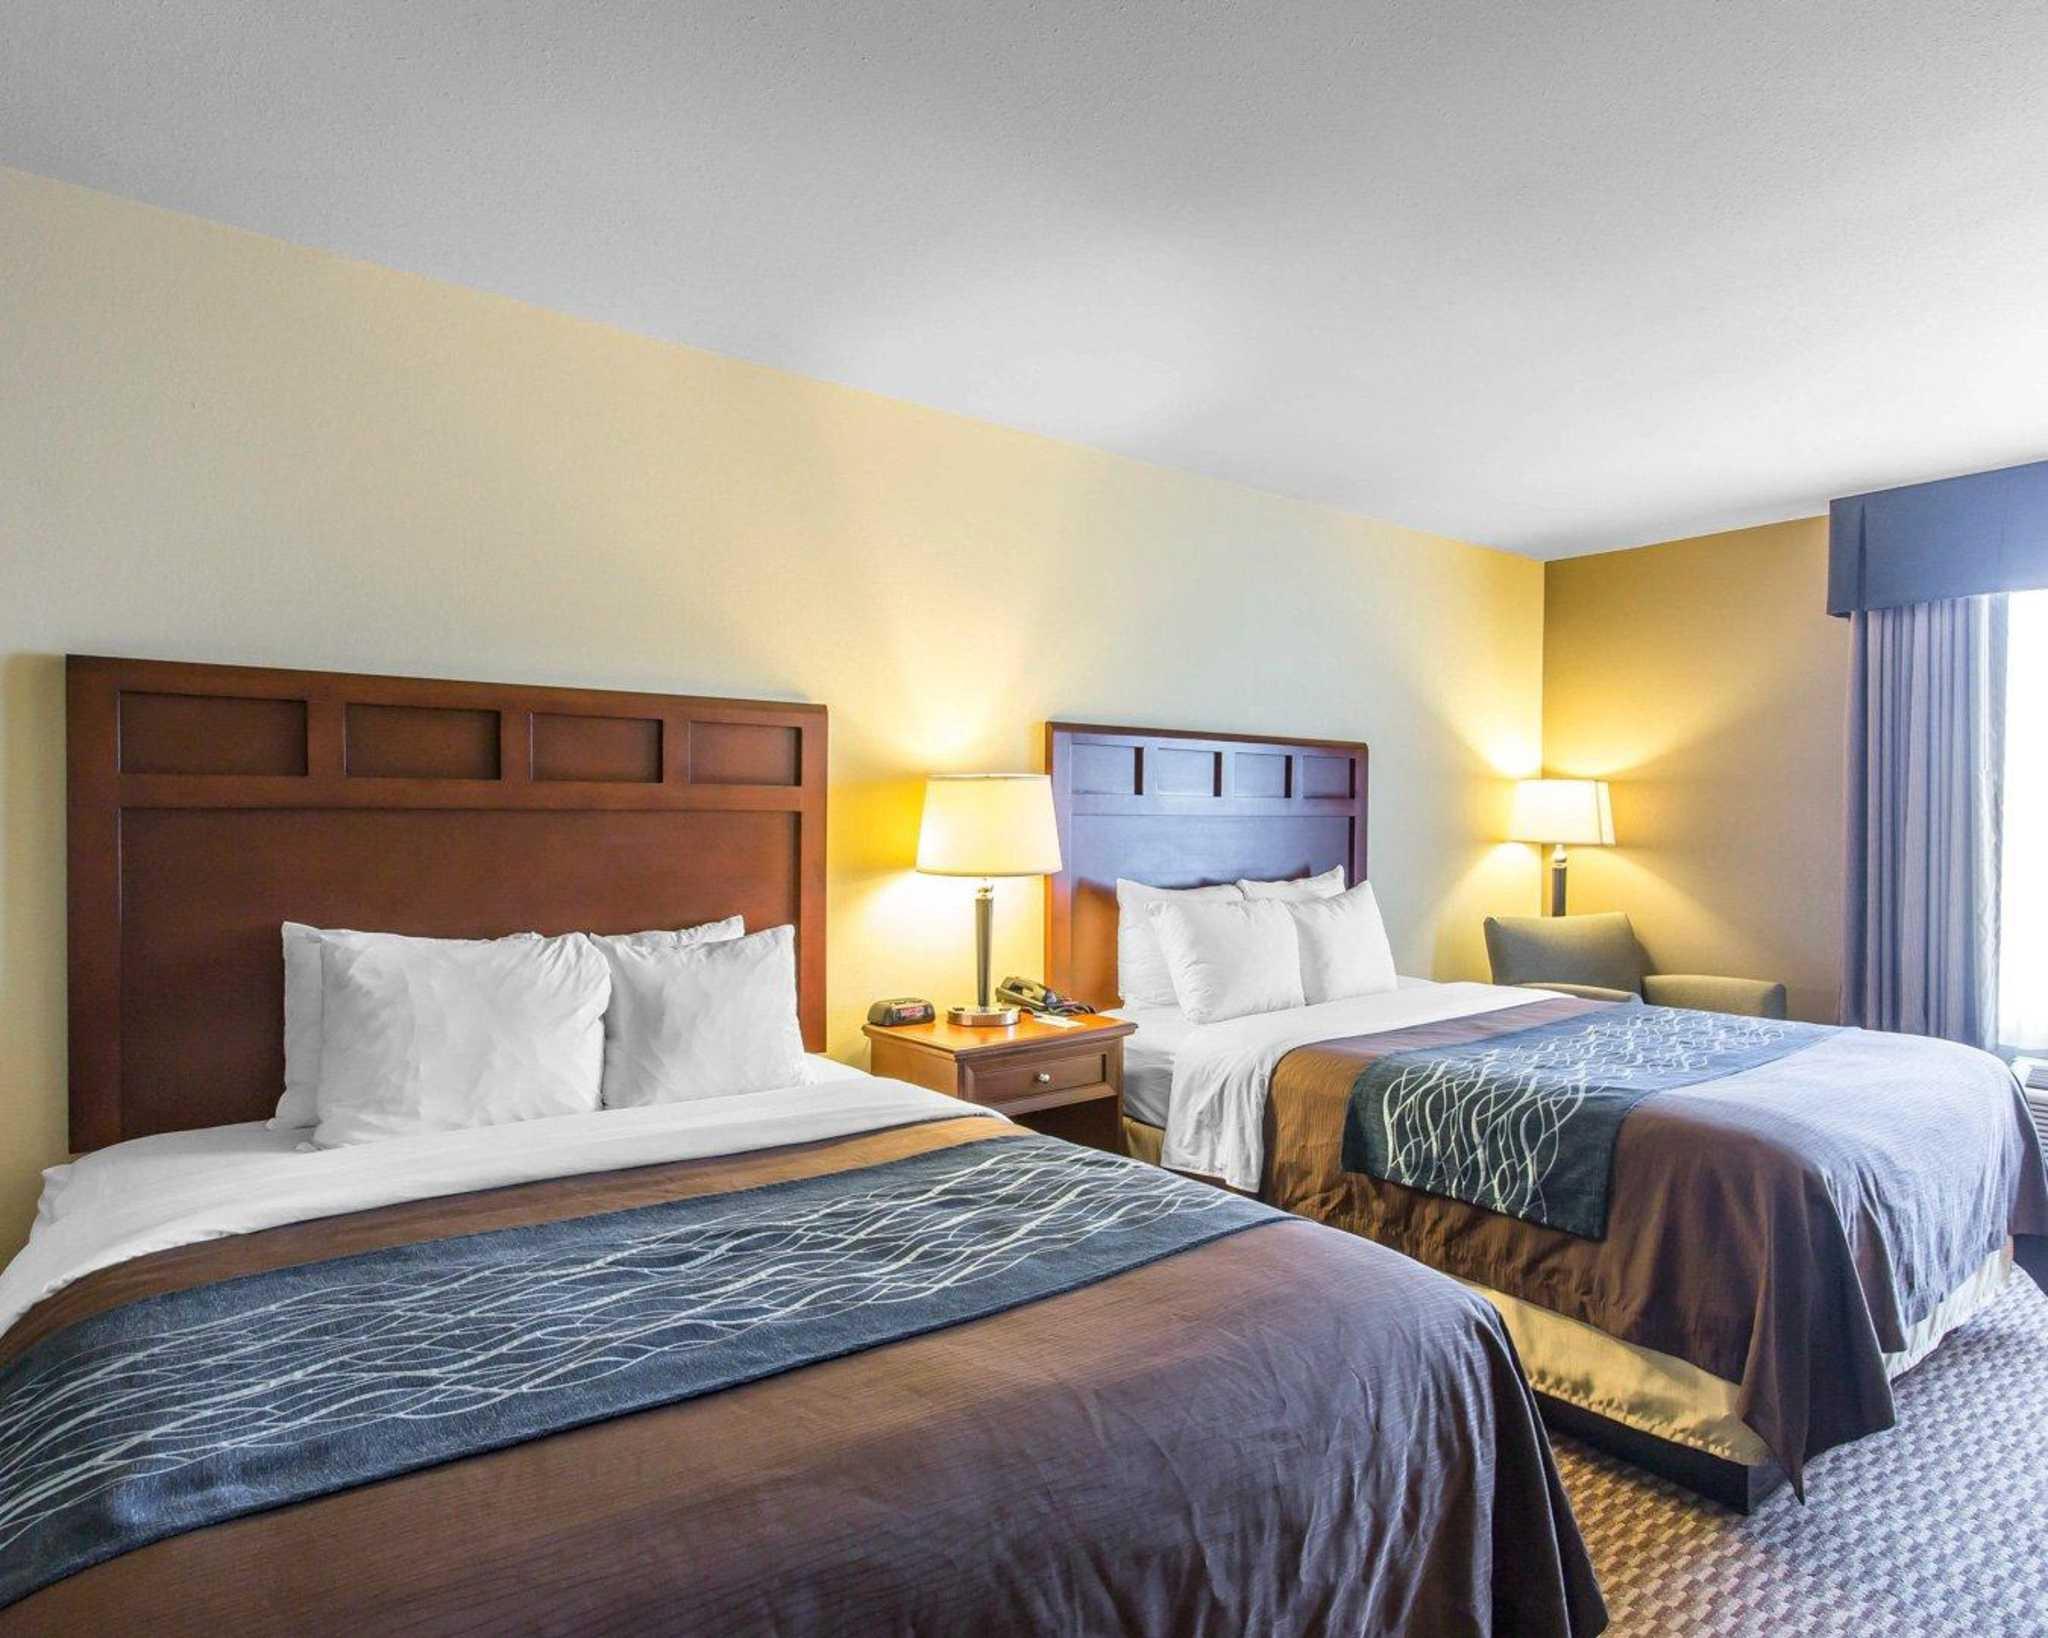 Comfort Inn Amp Suites Madisonville Kentucky Ky